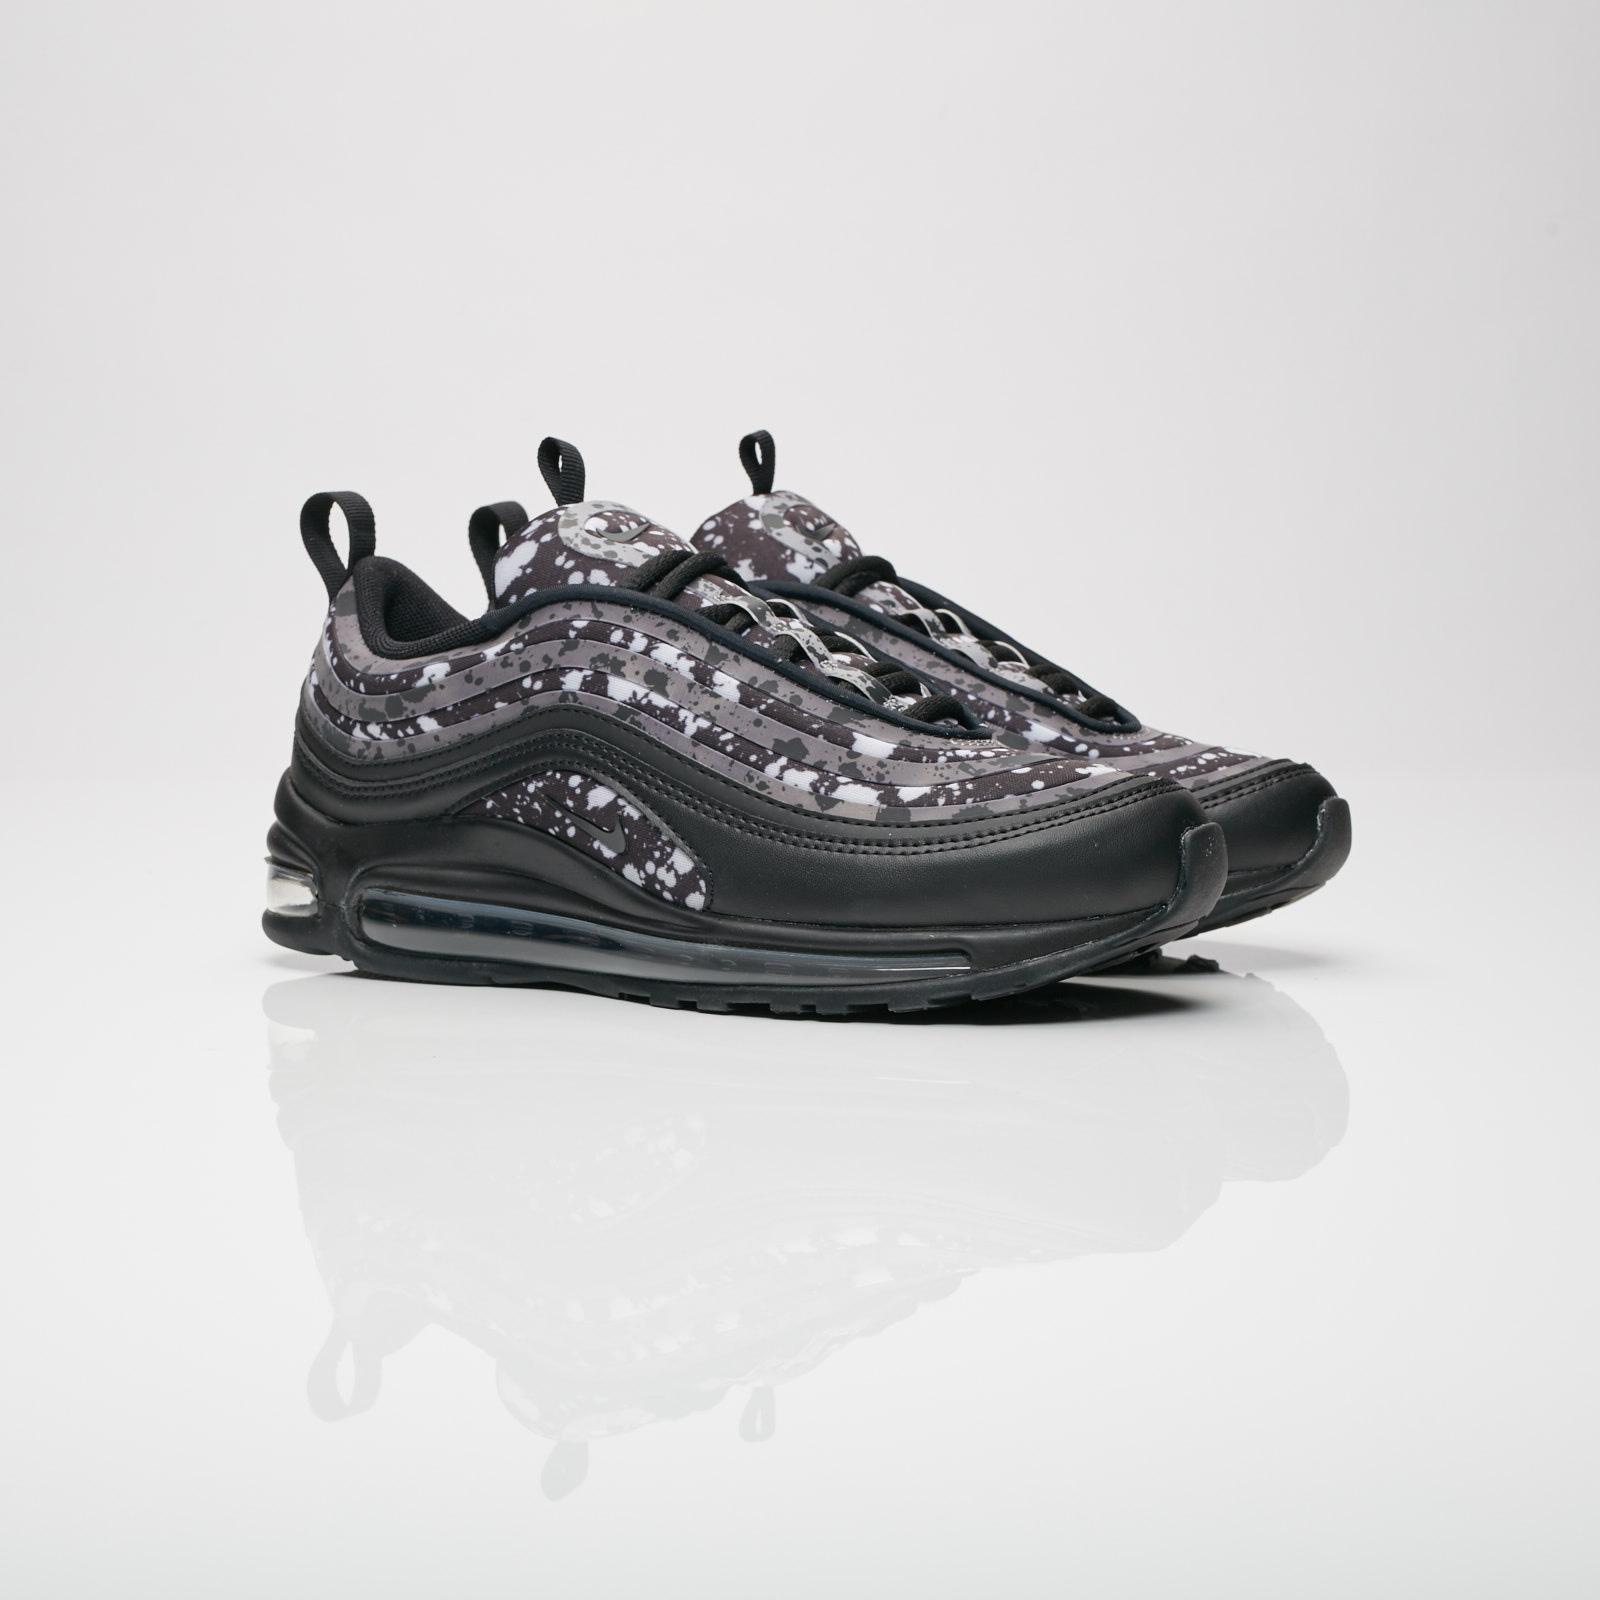 Nike Wmns Air Max 97 UL 17 PRM - Ao2325-002 - Sneakersnstuff ... 1b891f2d8